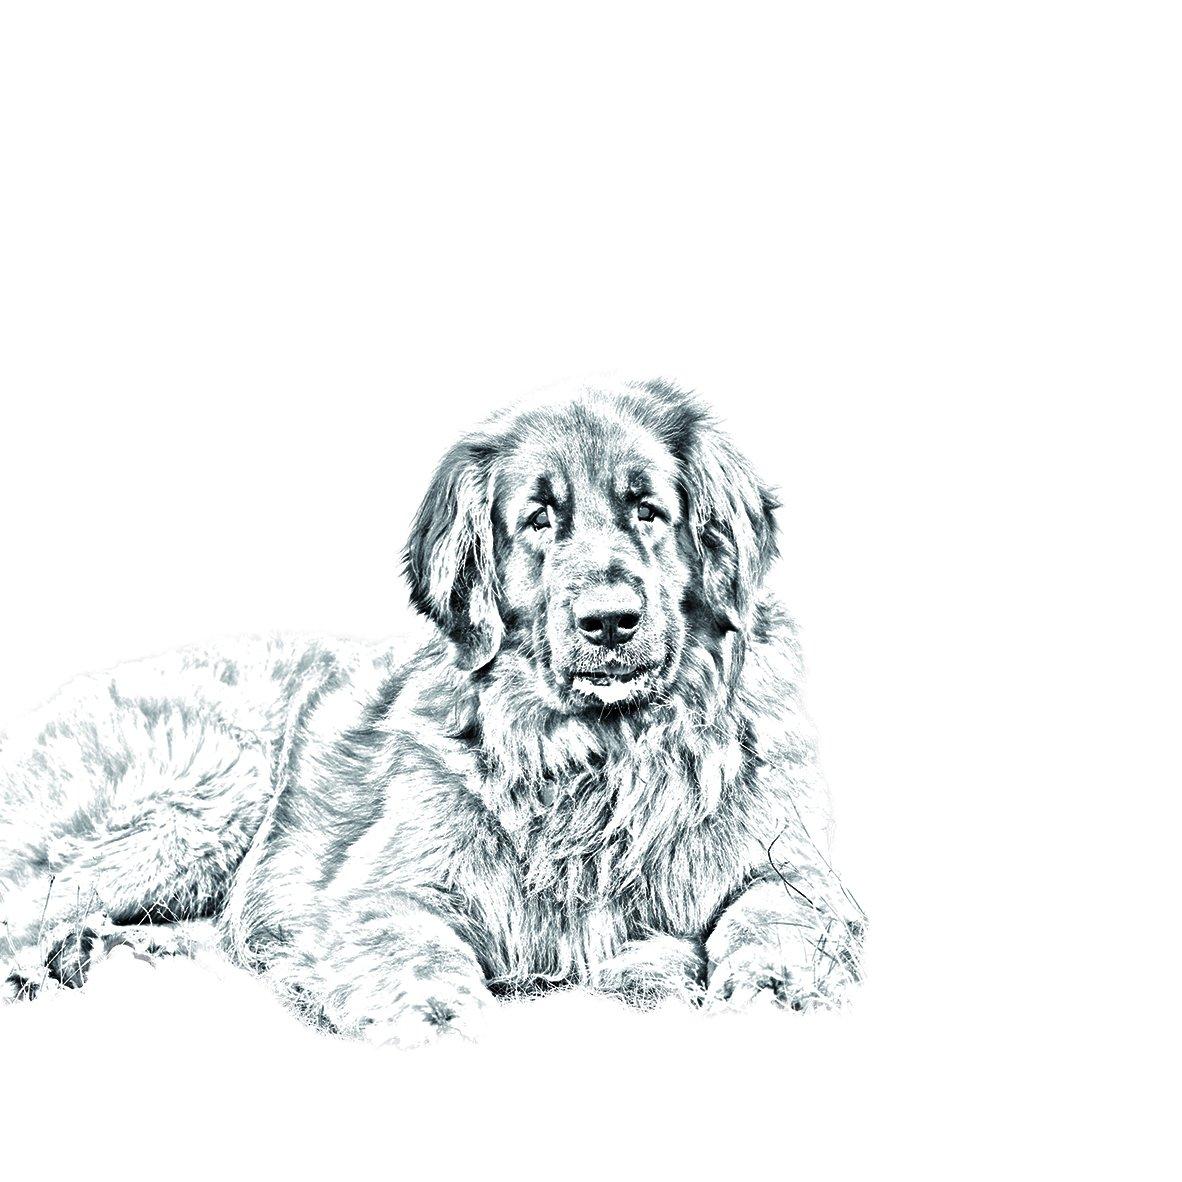 Unique Gift New keyrings with Purebred Dogs Art Dog Ltd Leonberger Sublimation